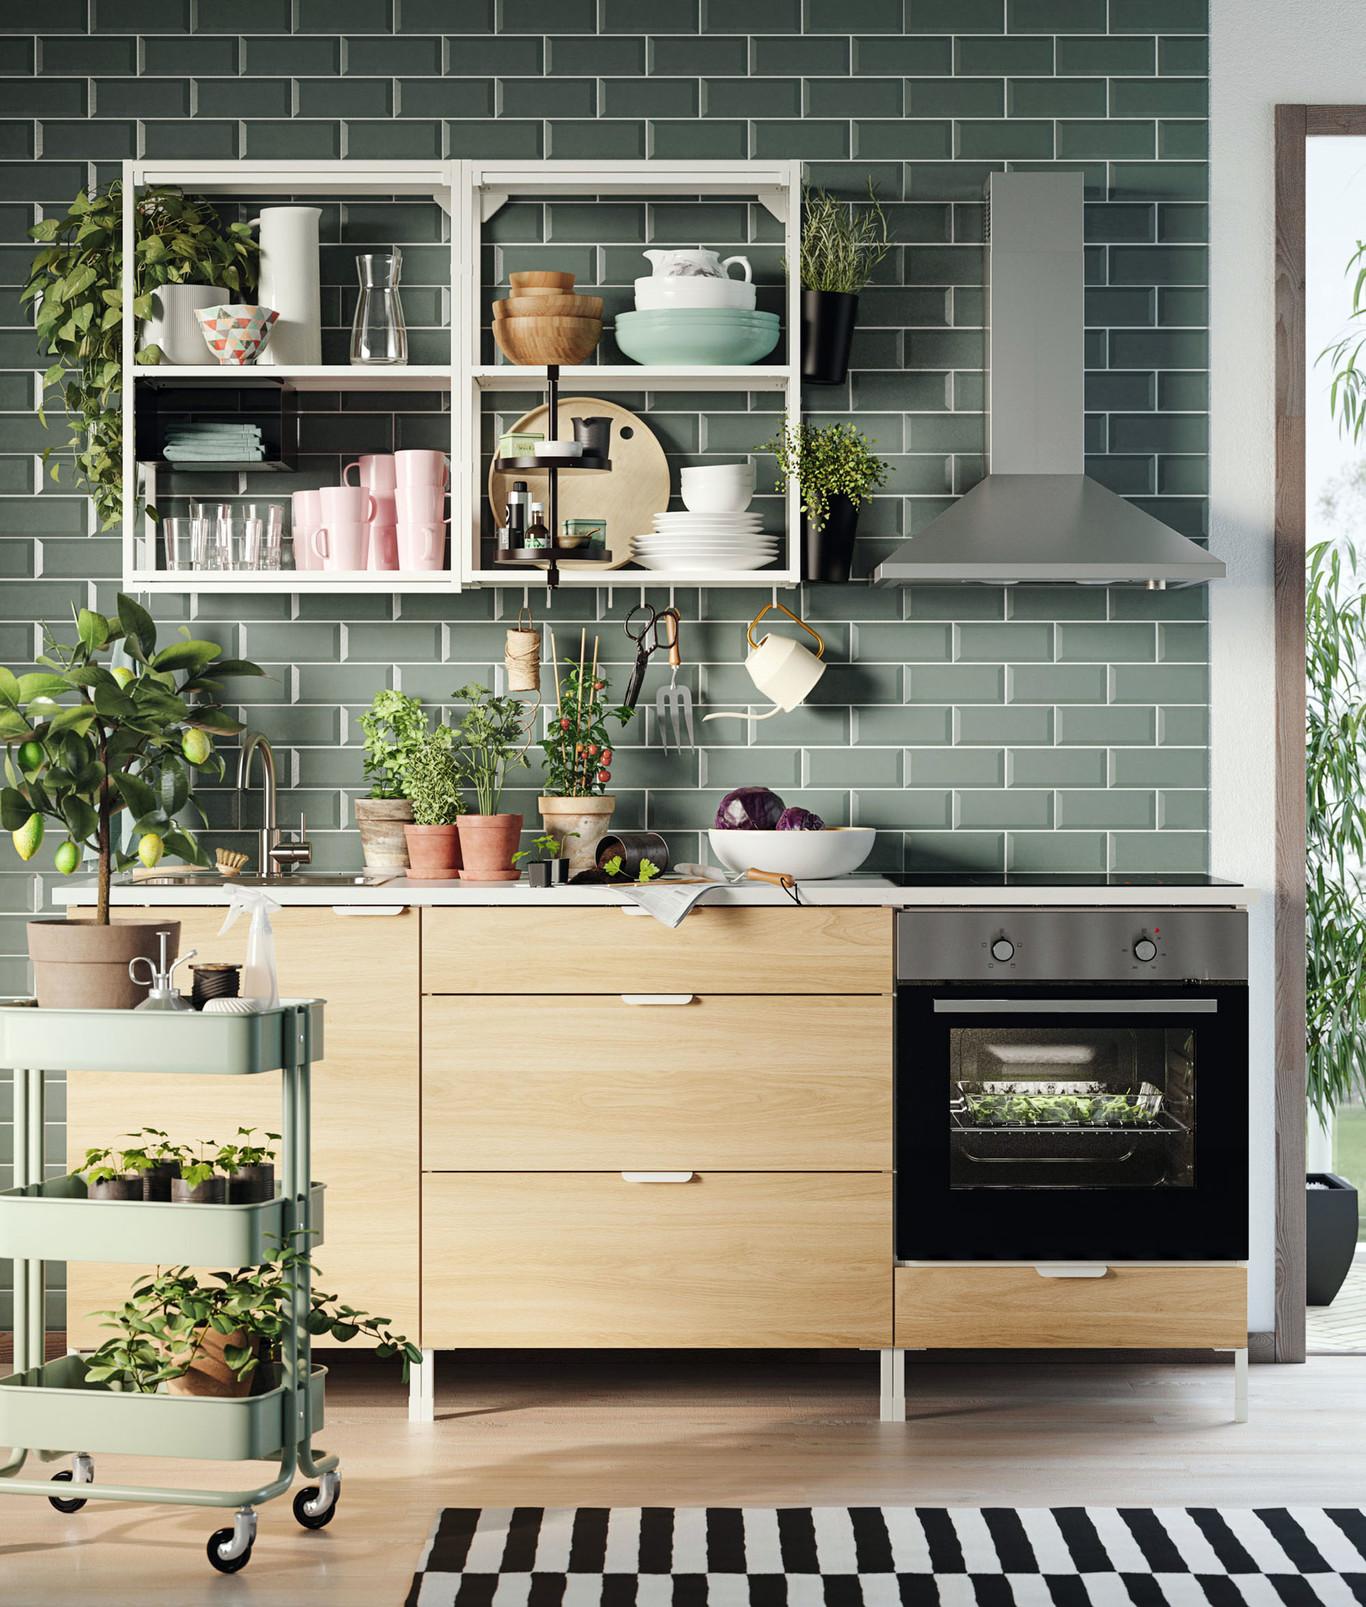 Avance catálogo de Ikea 2021; las mejores novedades para tu